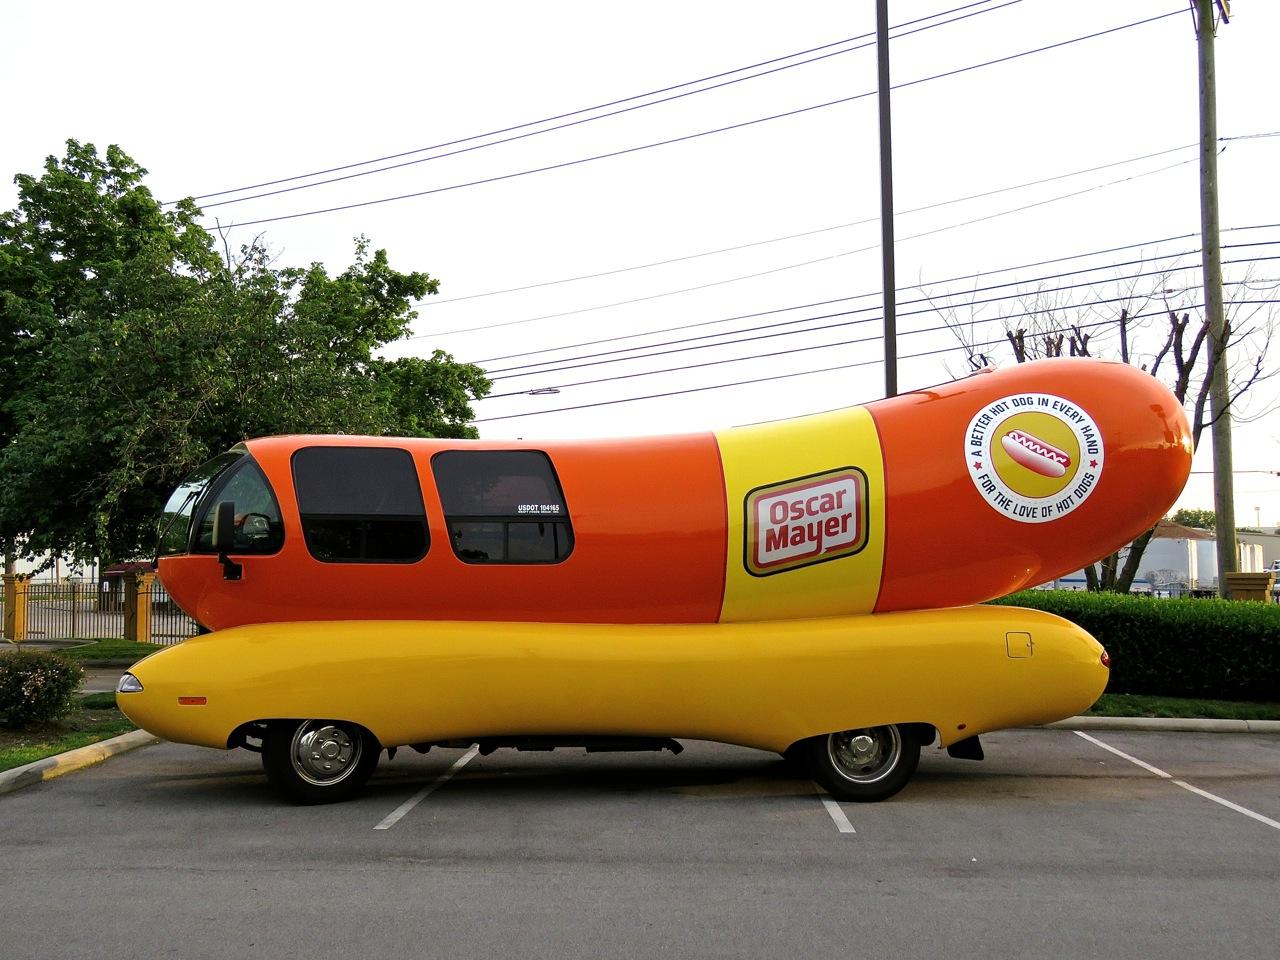 Oscar Mayer Wienermobile 2